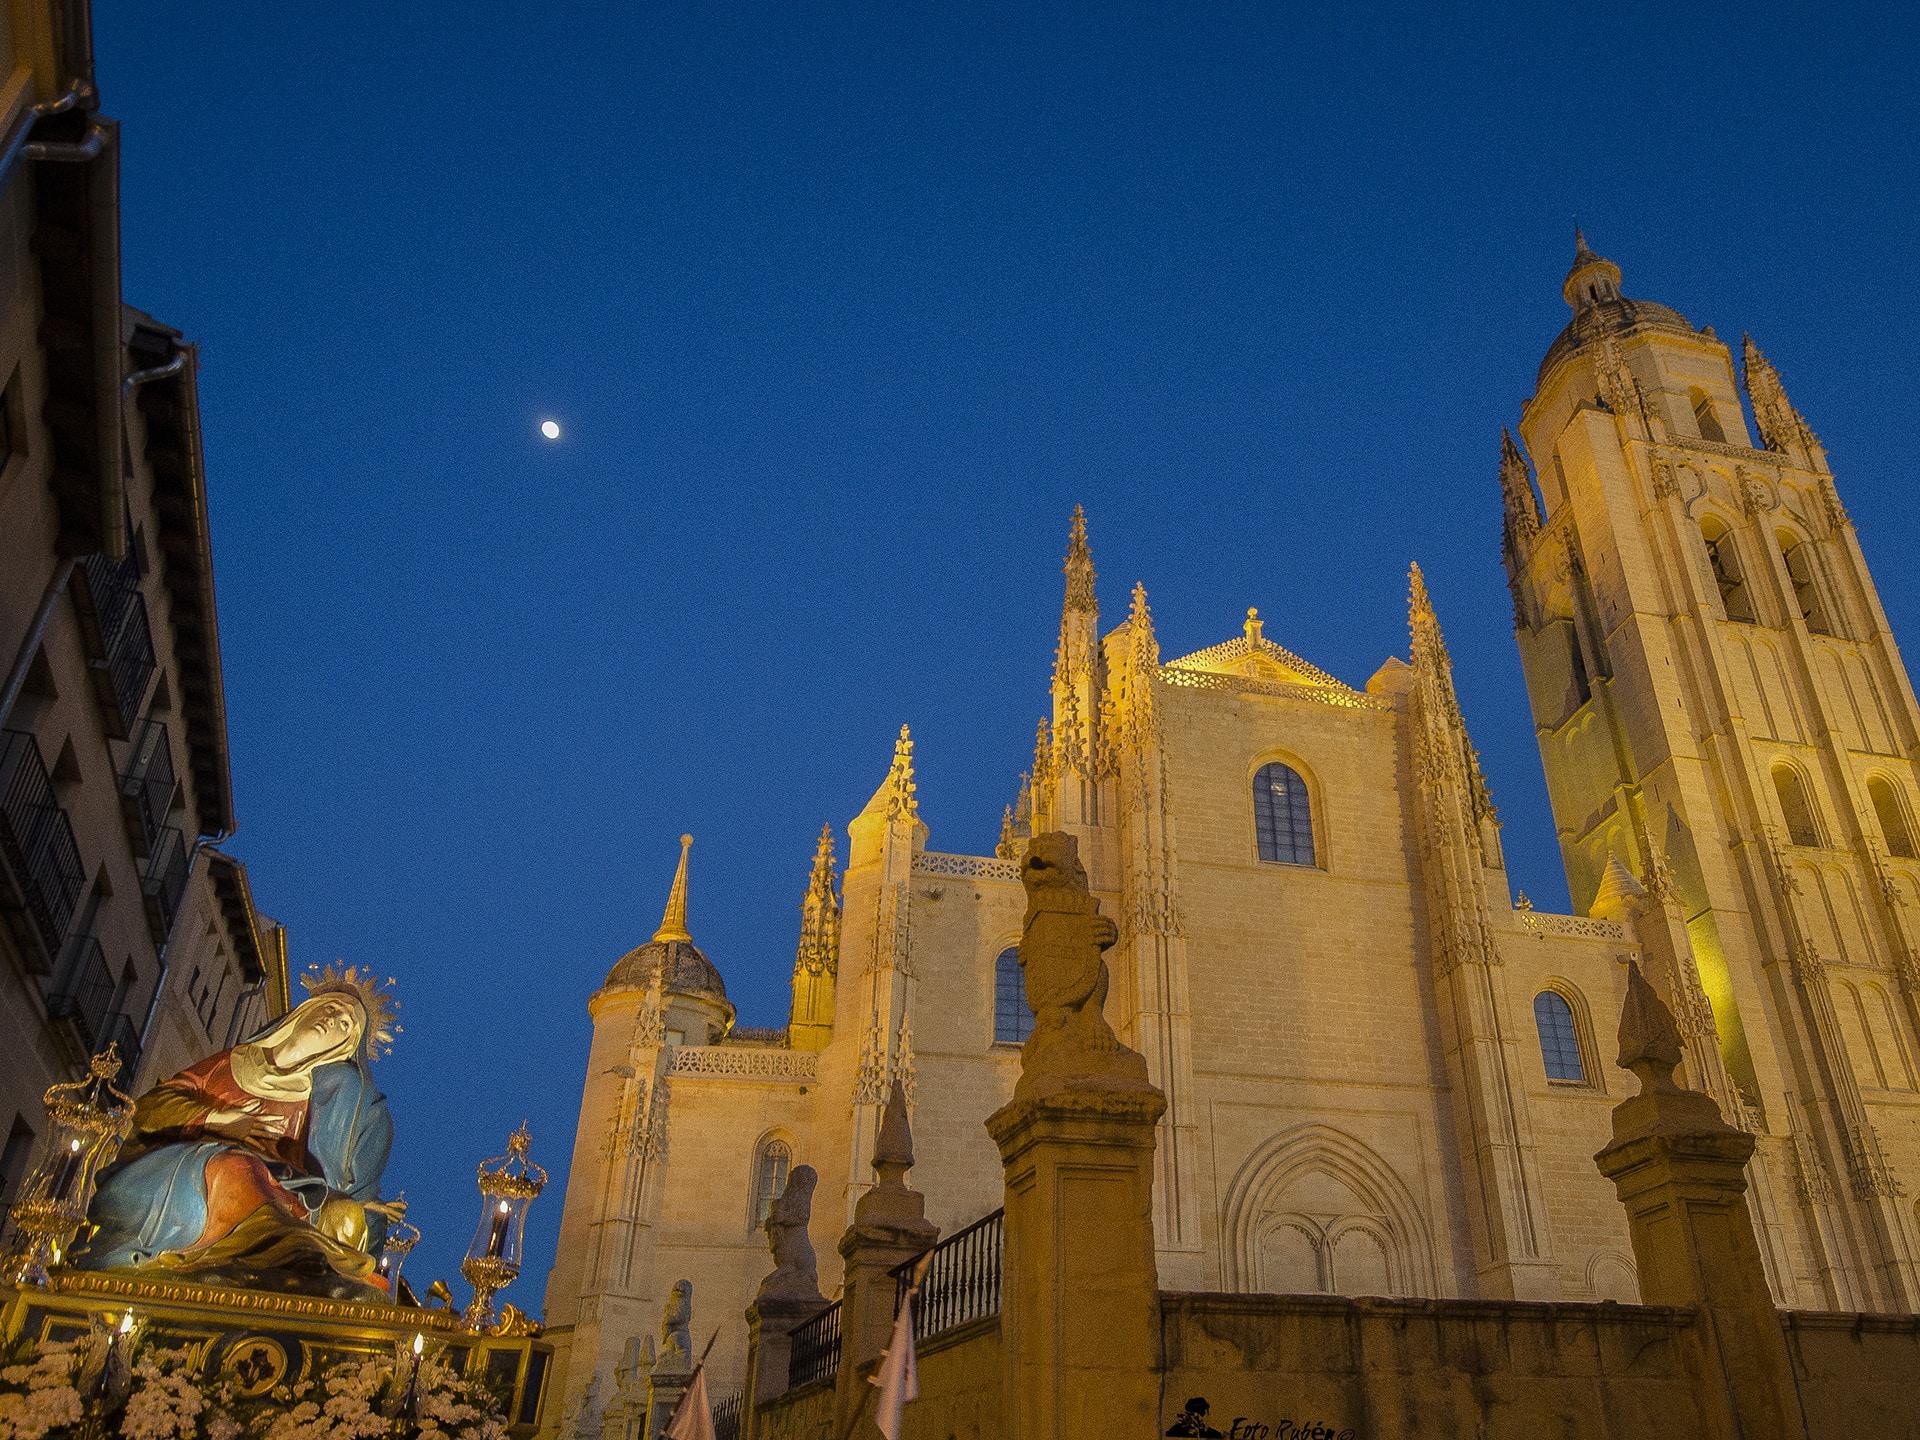 Procesion de Ntra. Madre Marçia Santismima de las Angustias, Segovia3